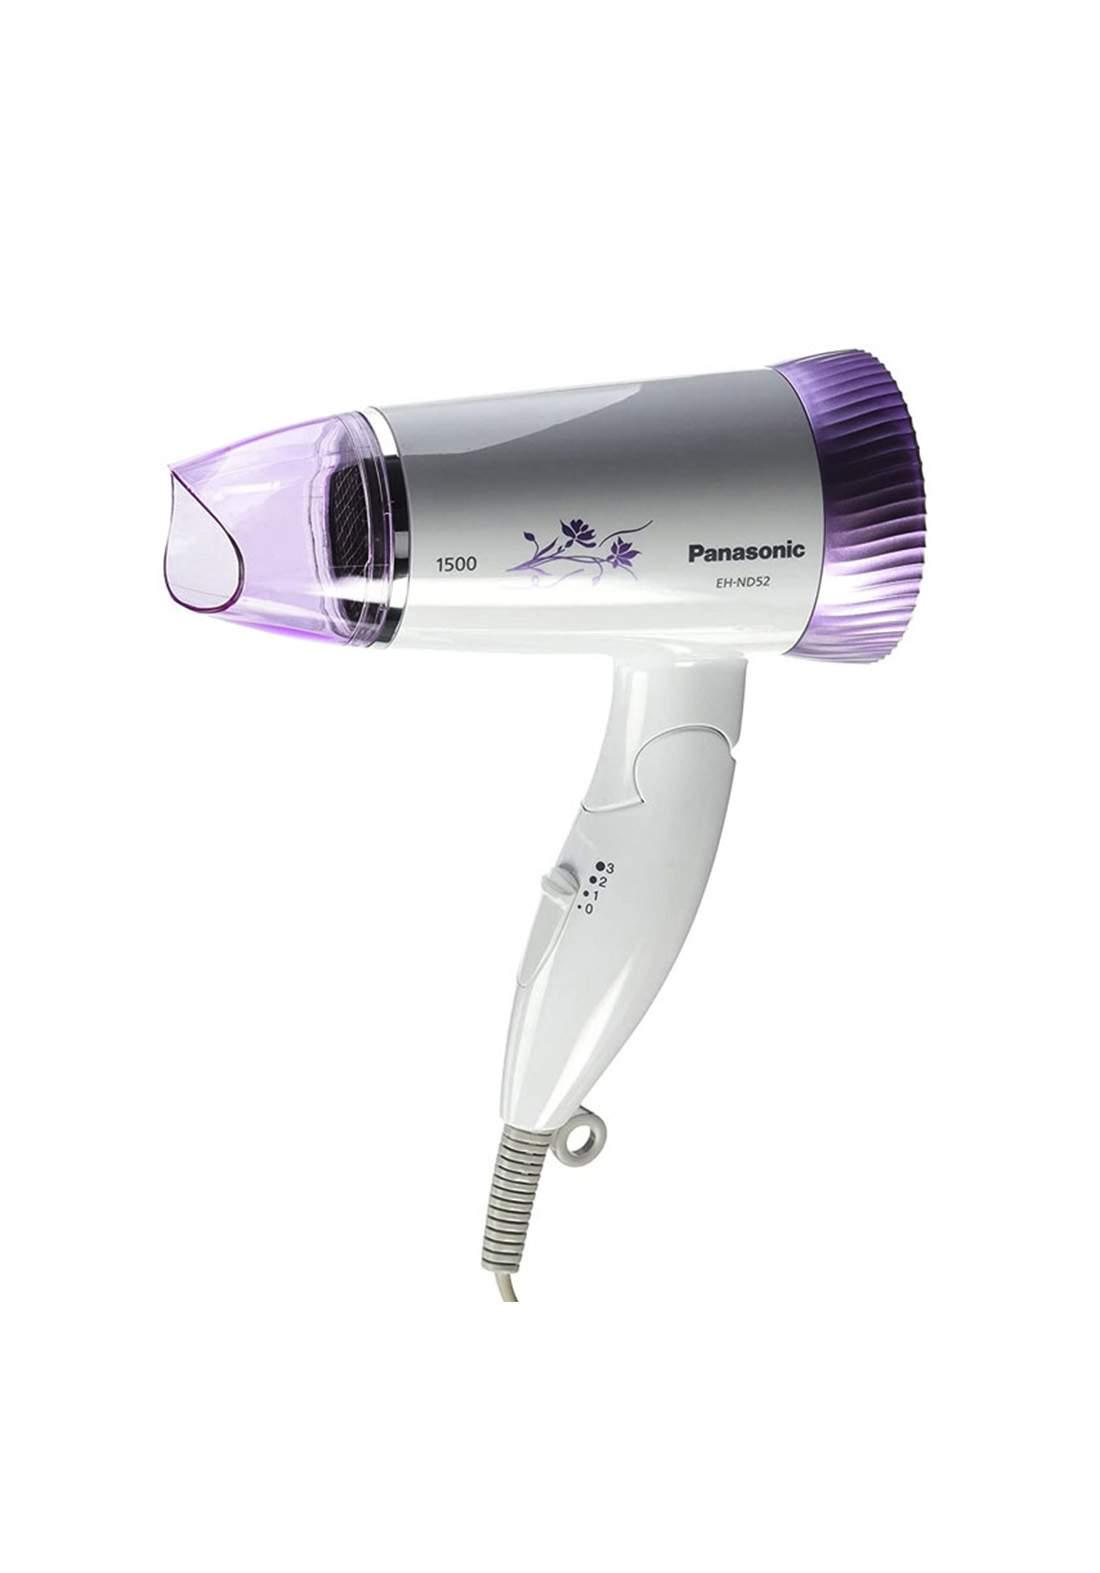 Panasonic EH-ND52-V Grooming Hair Dryer 1500w مجفف شعر